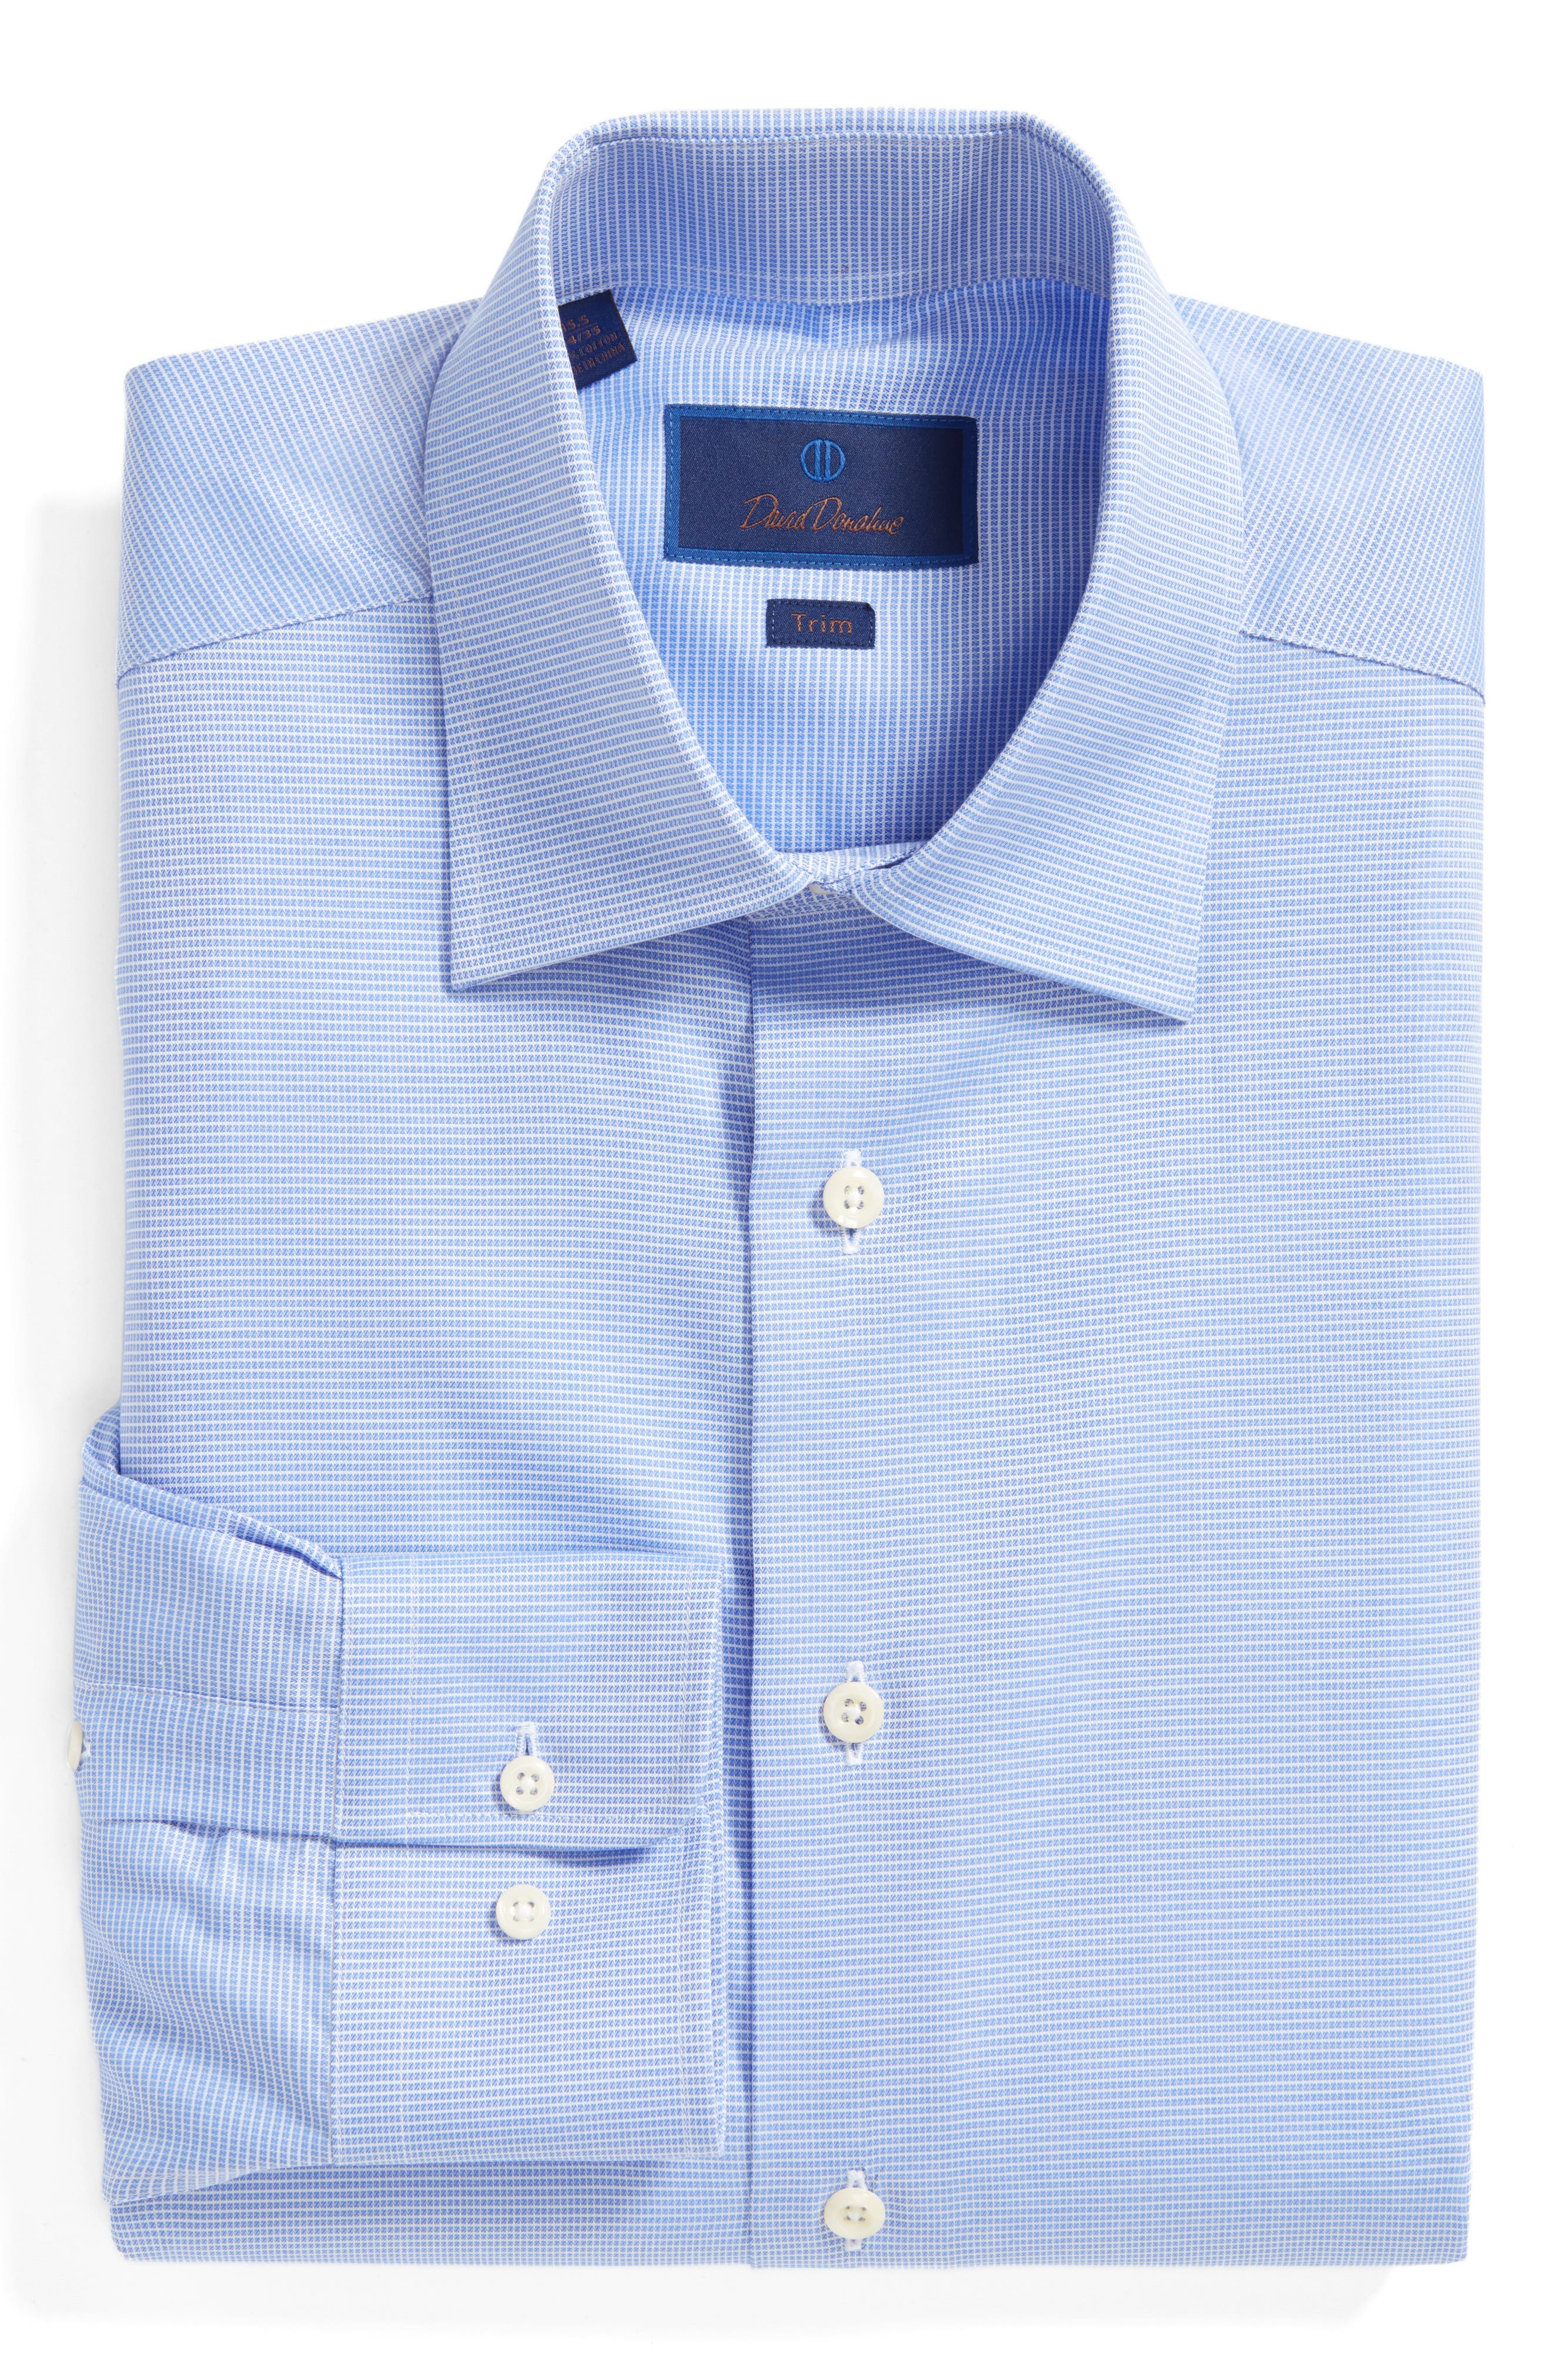 Trim Fit Microcheck Dress Shirt,                             Alternate thumbnail 3, color,                             BLUE